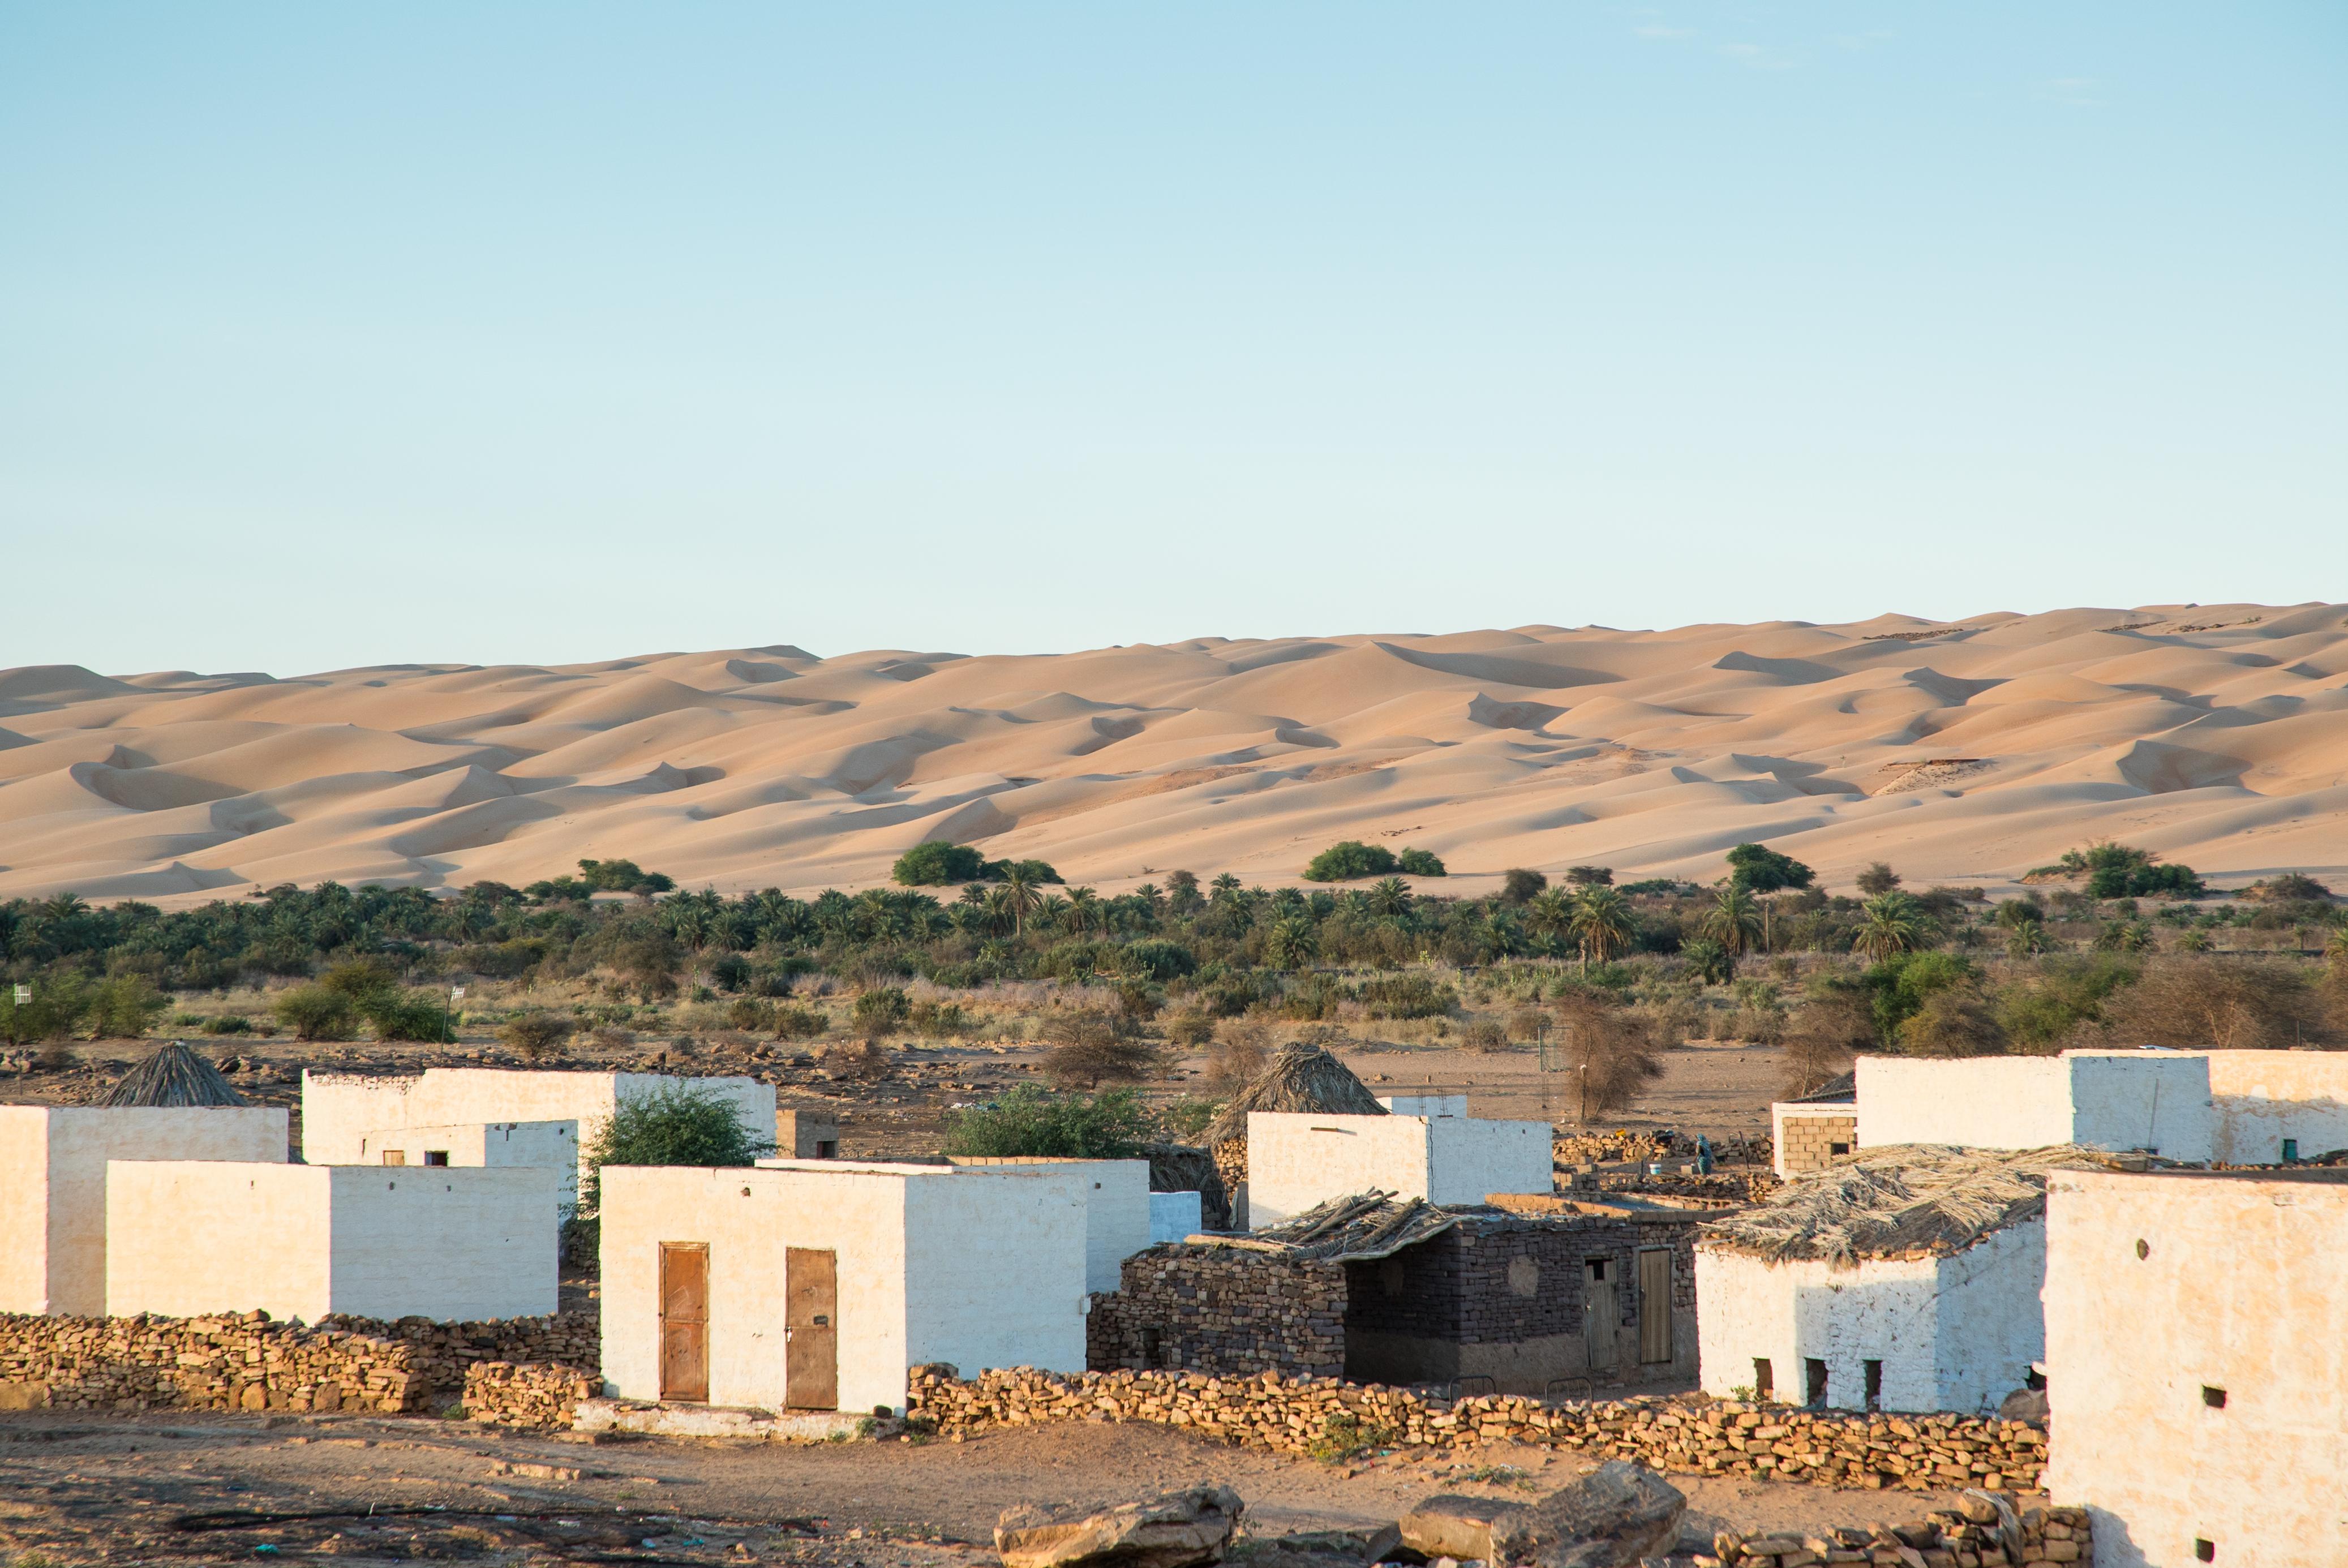 Maaden Mauritanie - Fonds de Dotation Pierre Rabhi